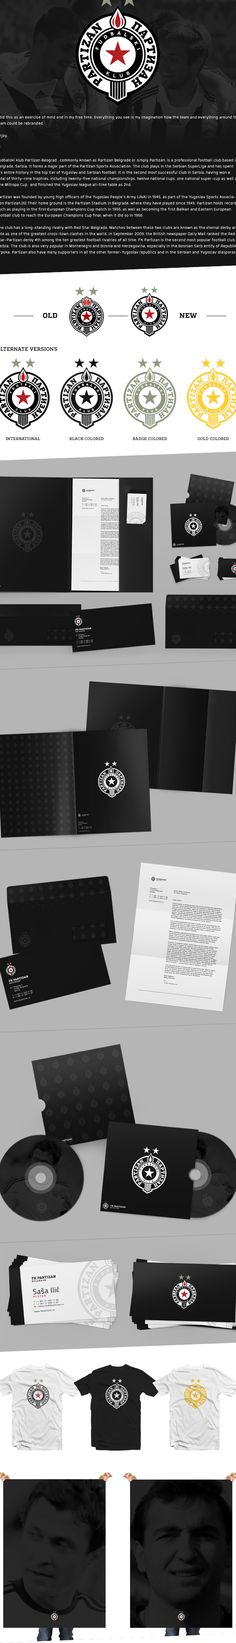 FK Partizan Rebranding on Behance